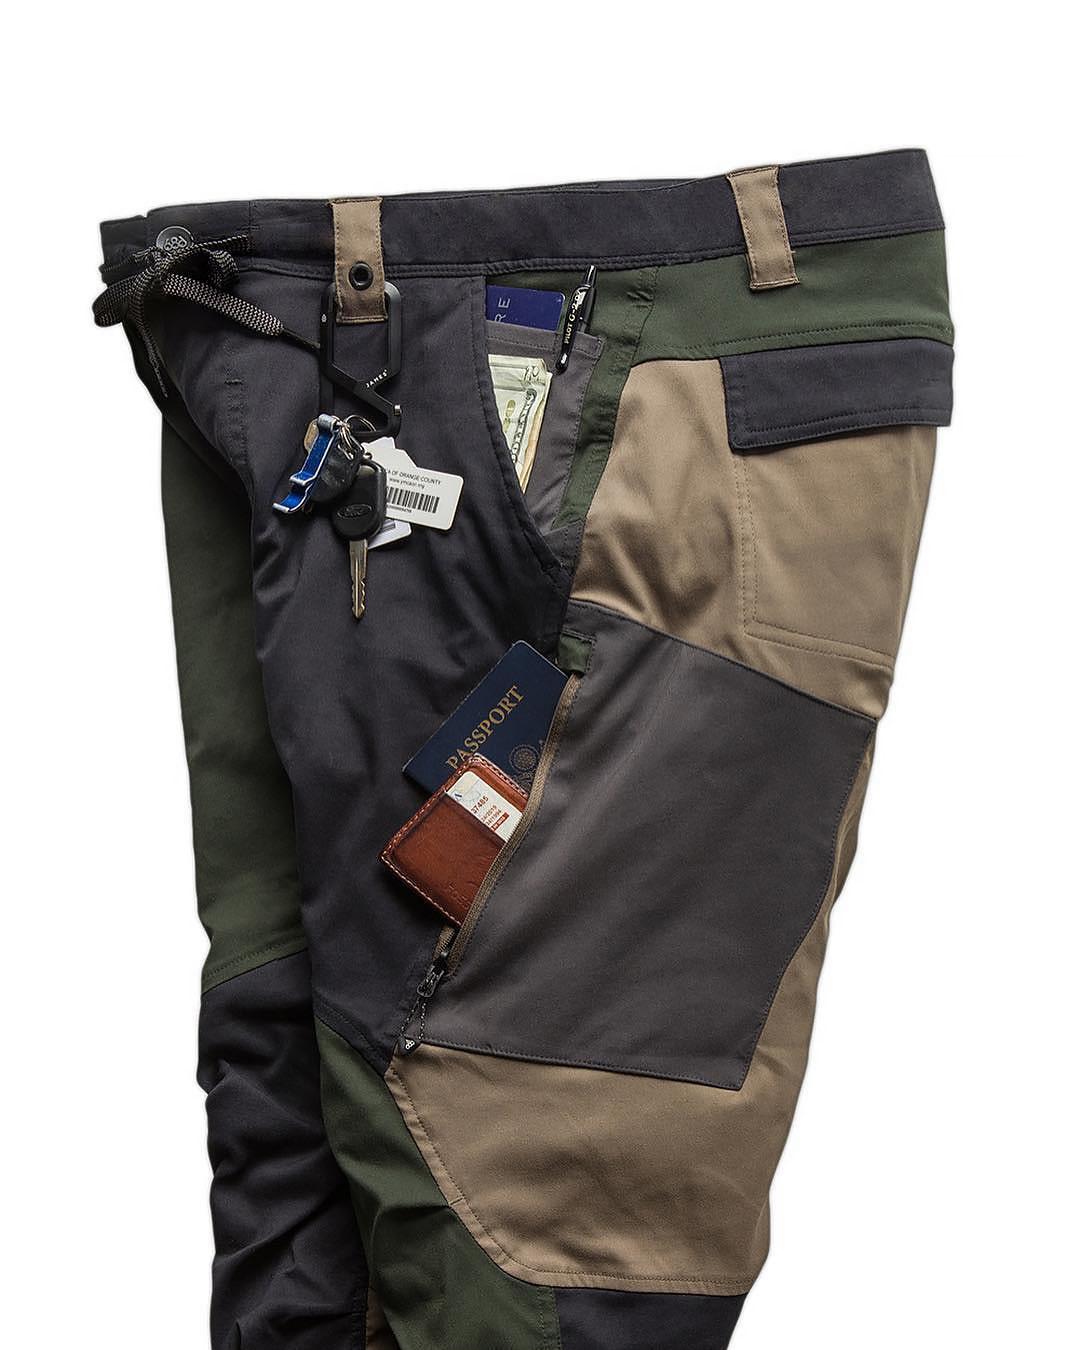 Anything Multi-Cargo Pant